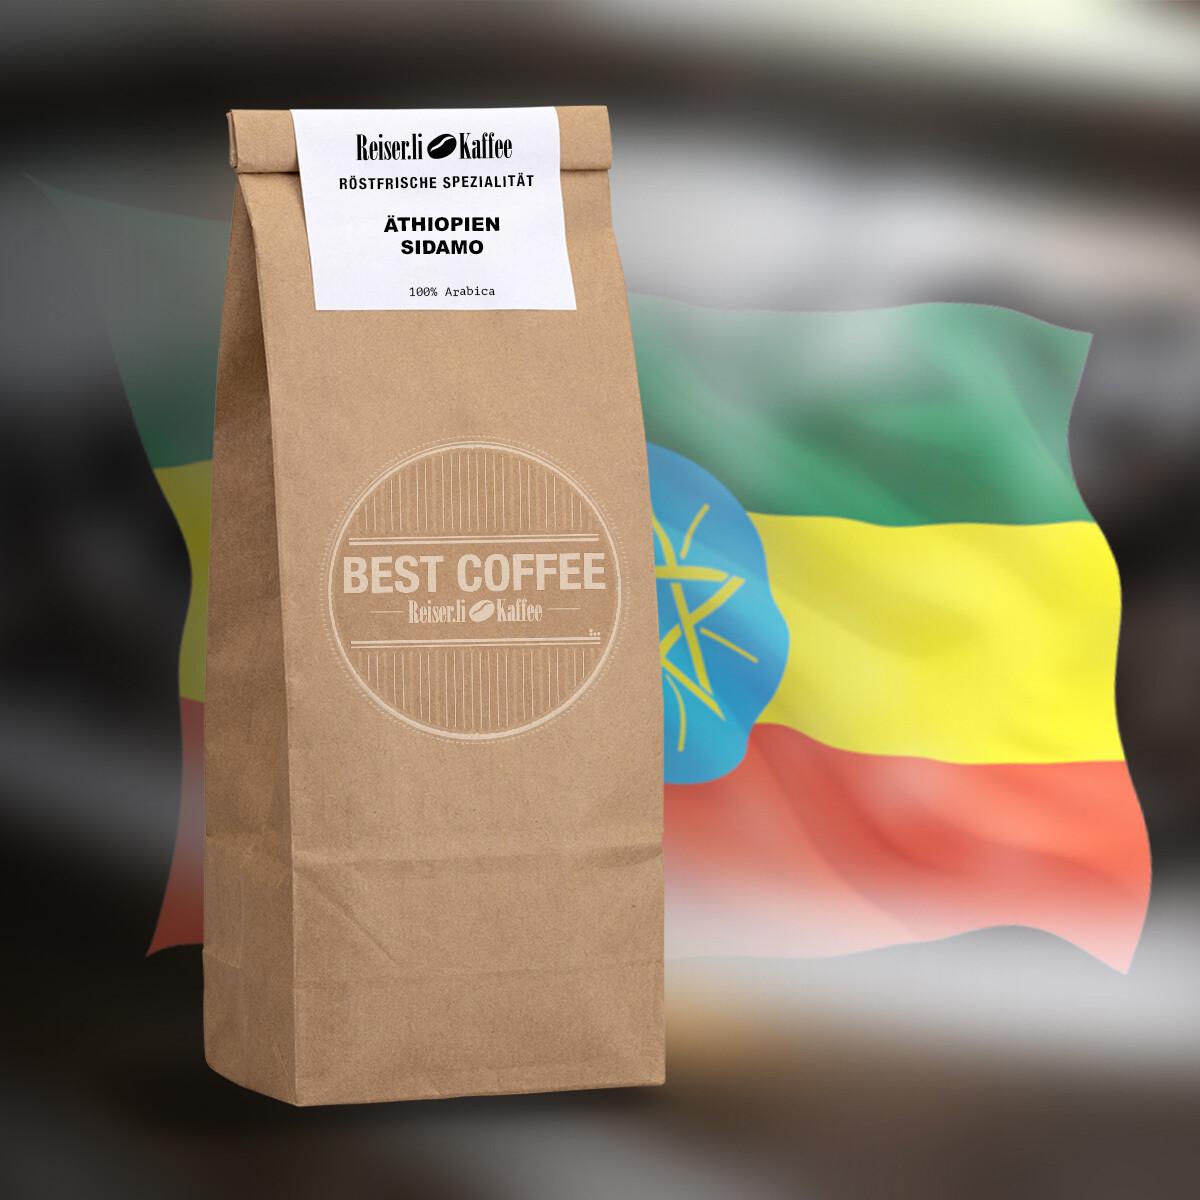 Äthiopien SIDAMO (200gr)